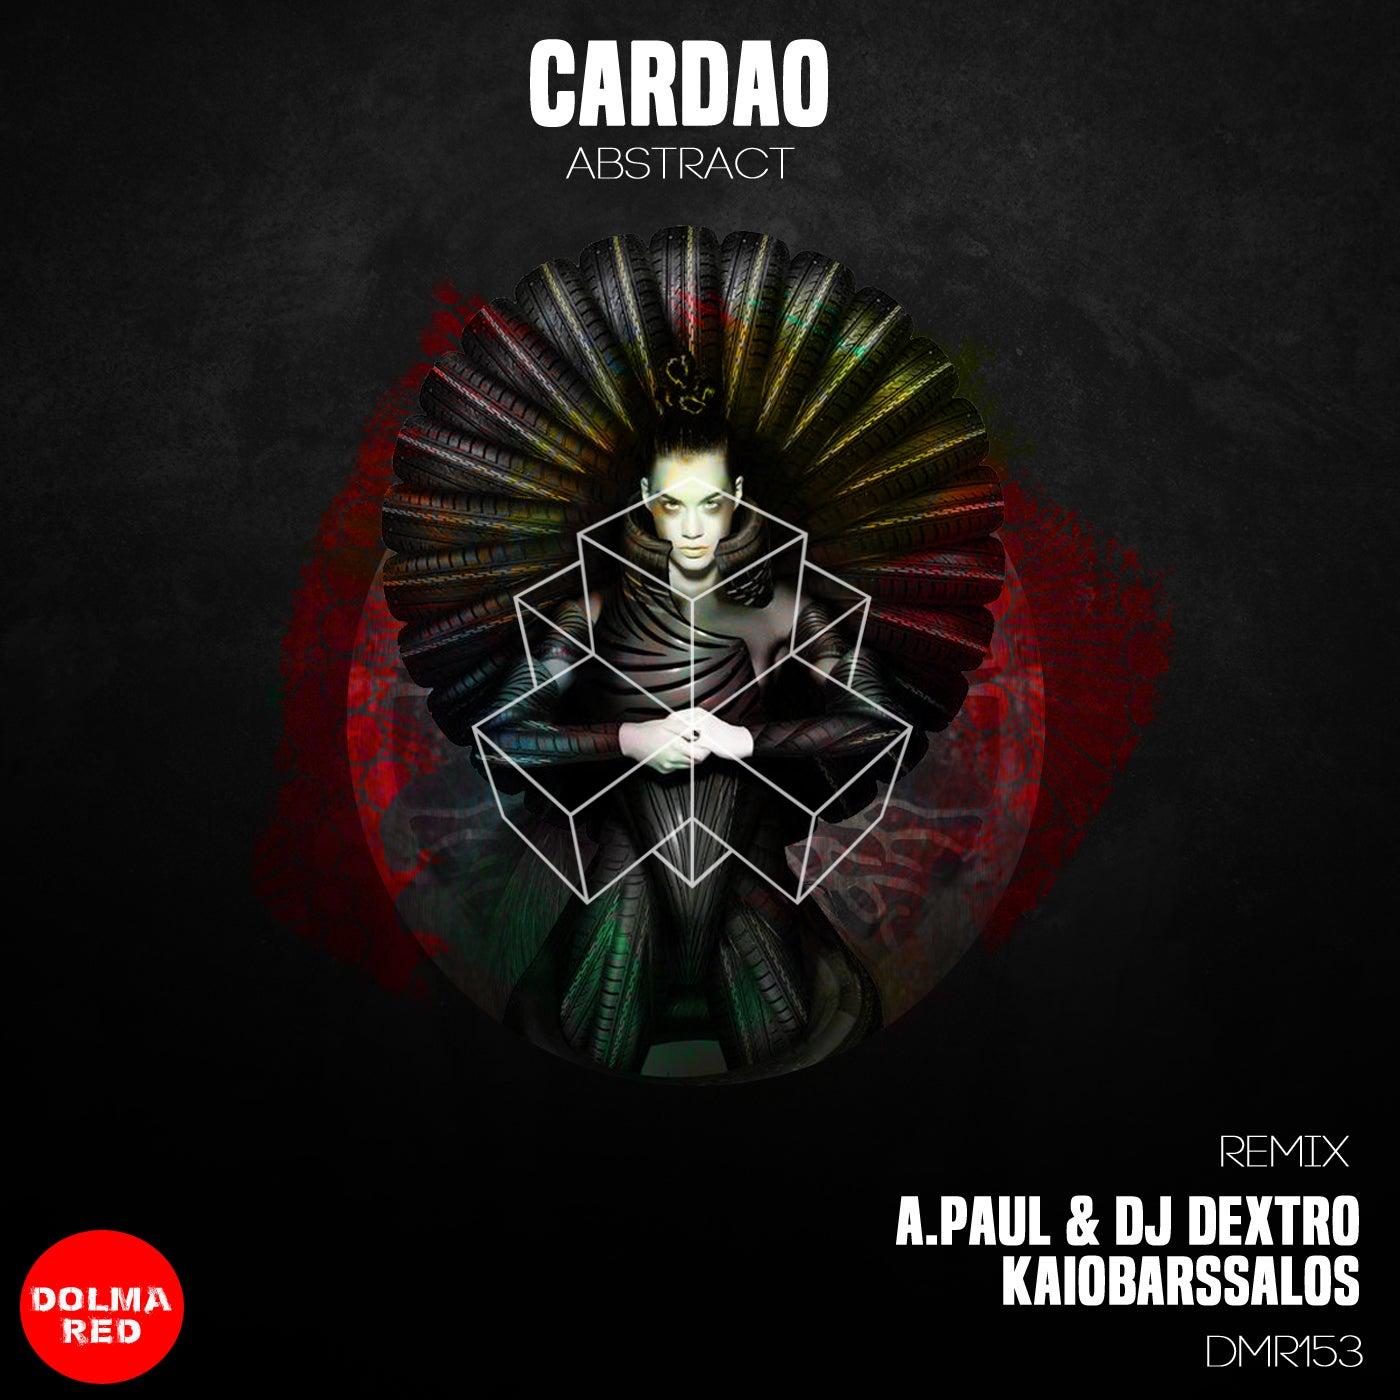 Abstract (A.PAUL, DJ DEXTRO Remix)